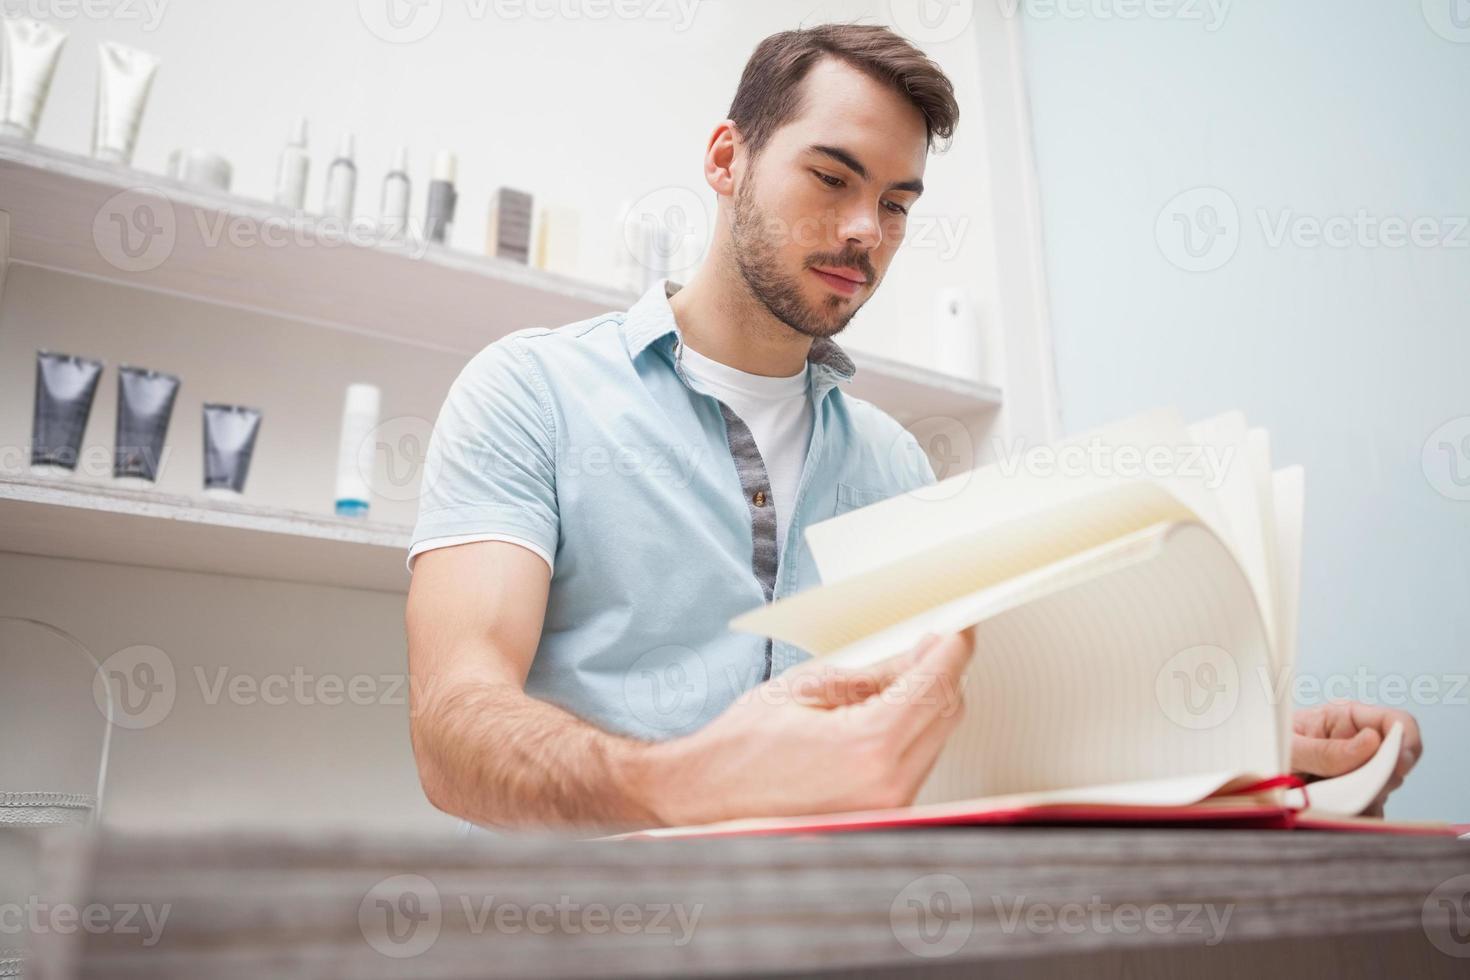 peluquero sonriente con stock book foto